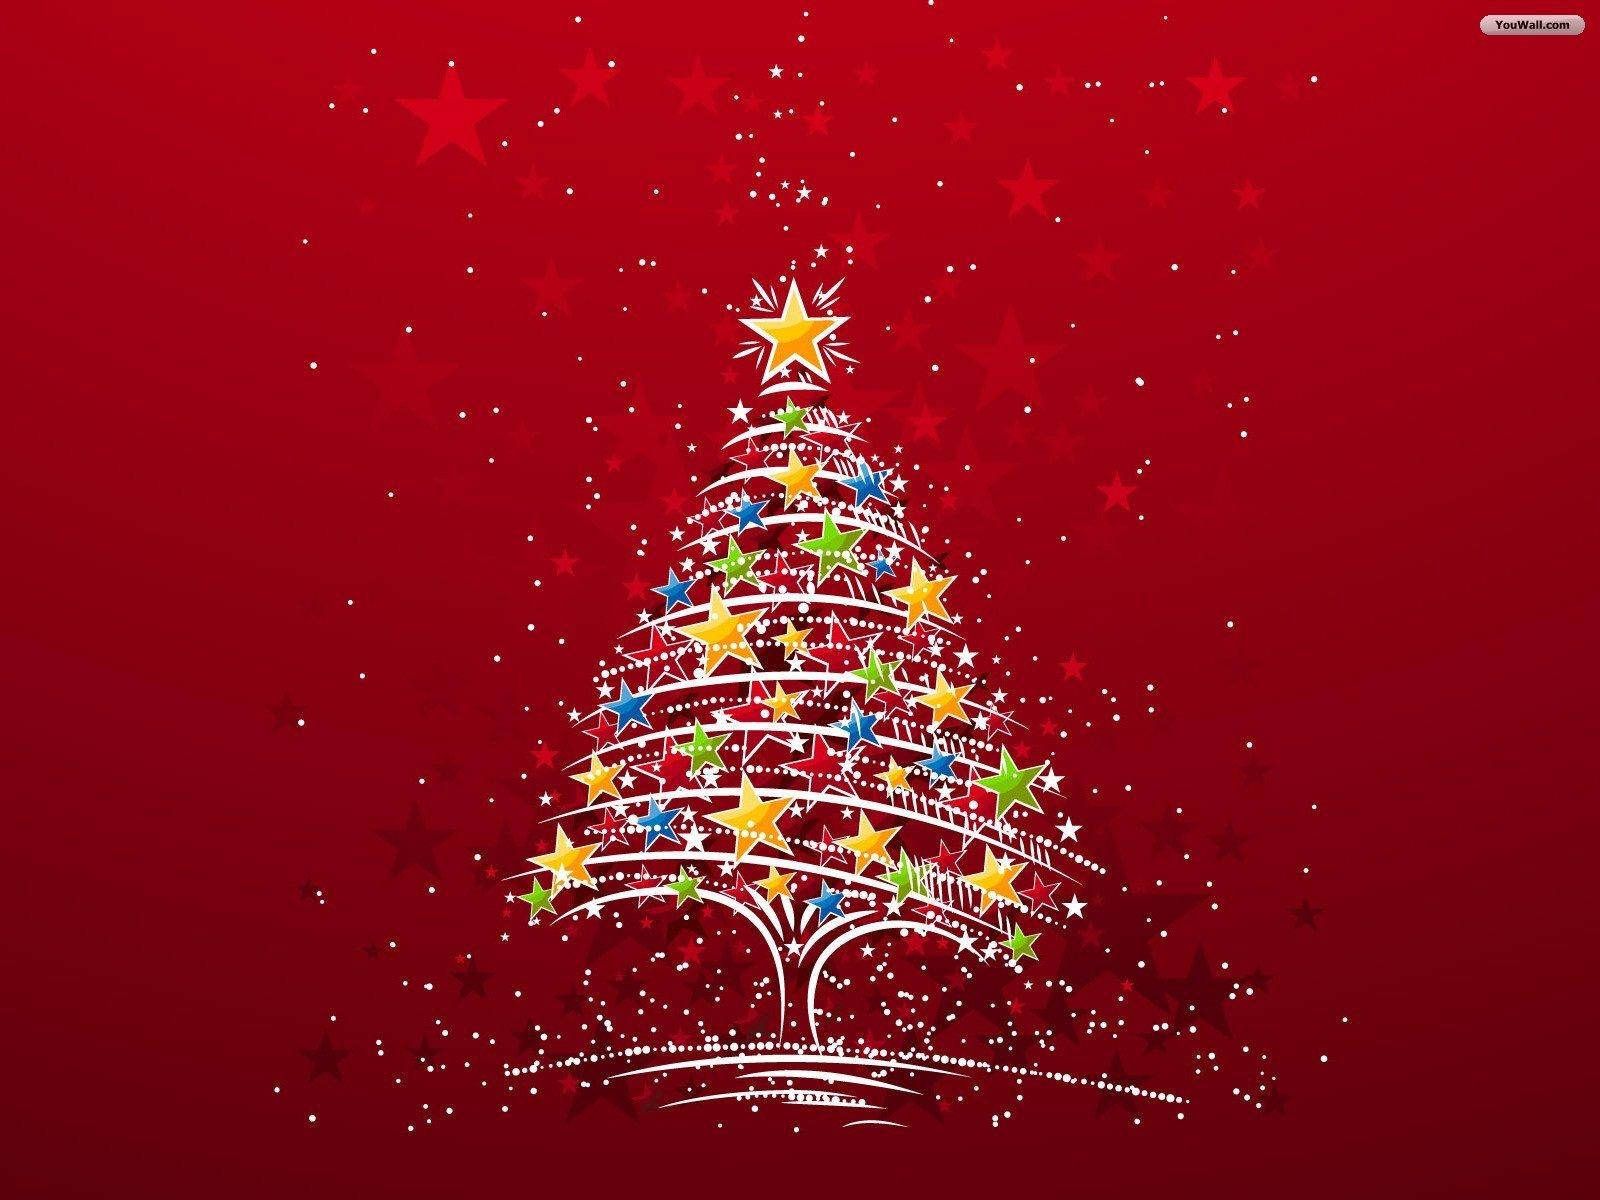 - Merry Christmas Wallpaper - wallpaper,wallpapers,free wallpaper ...